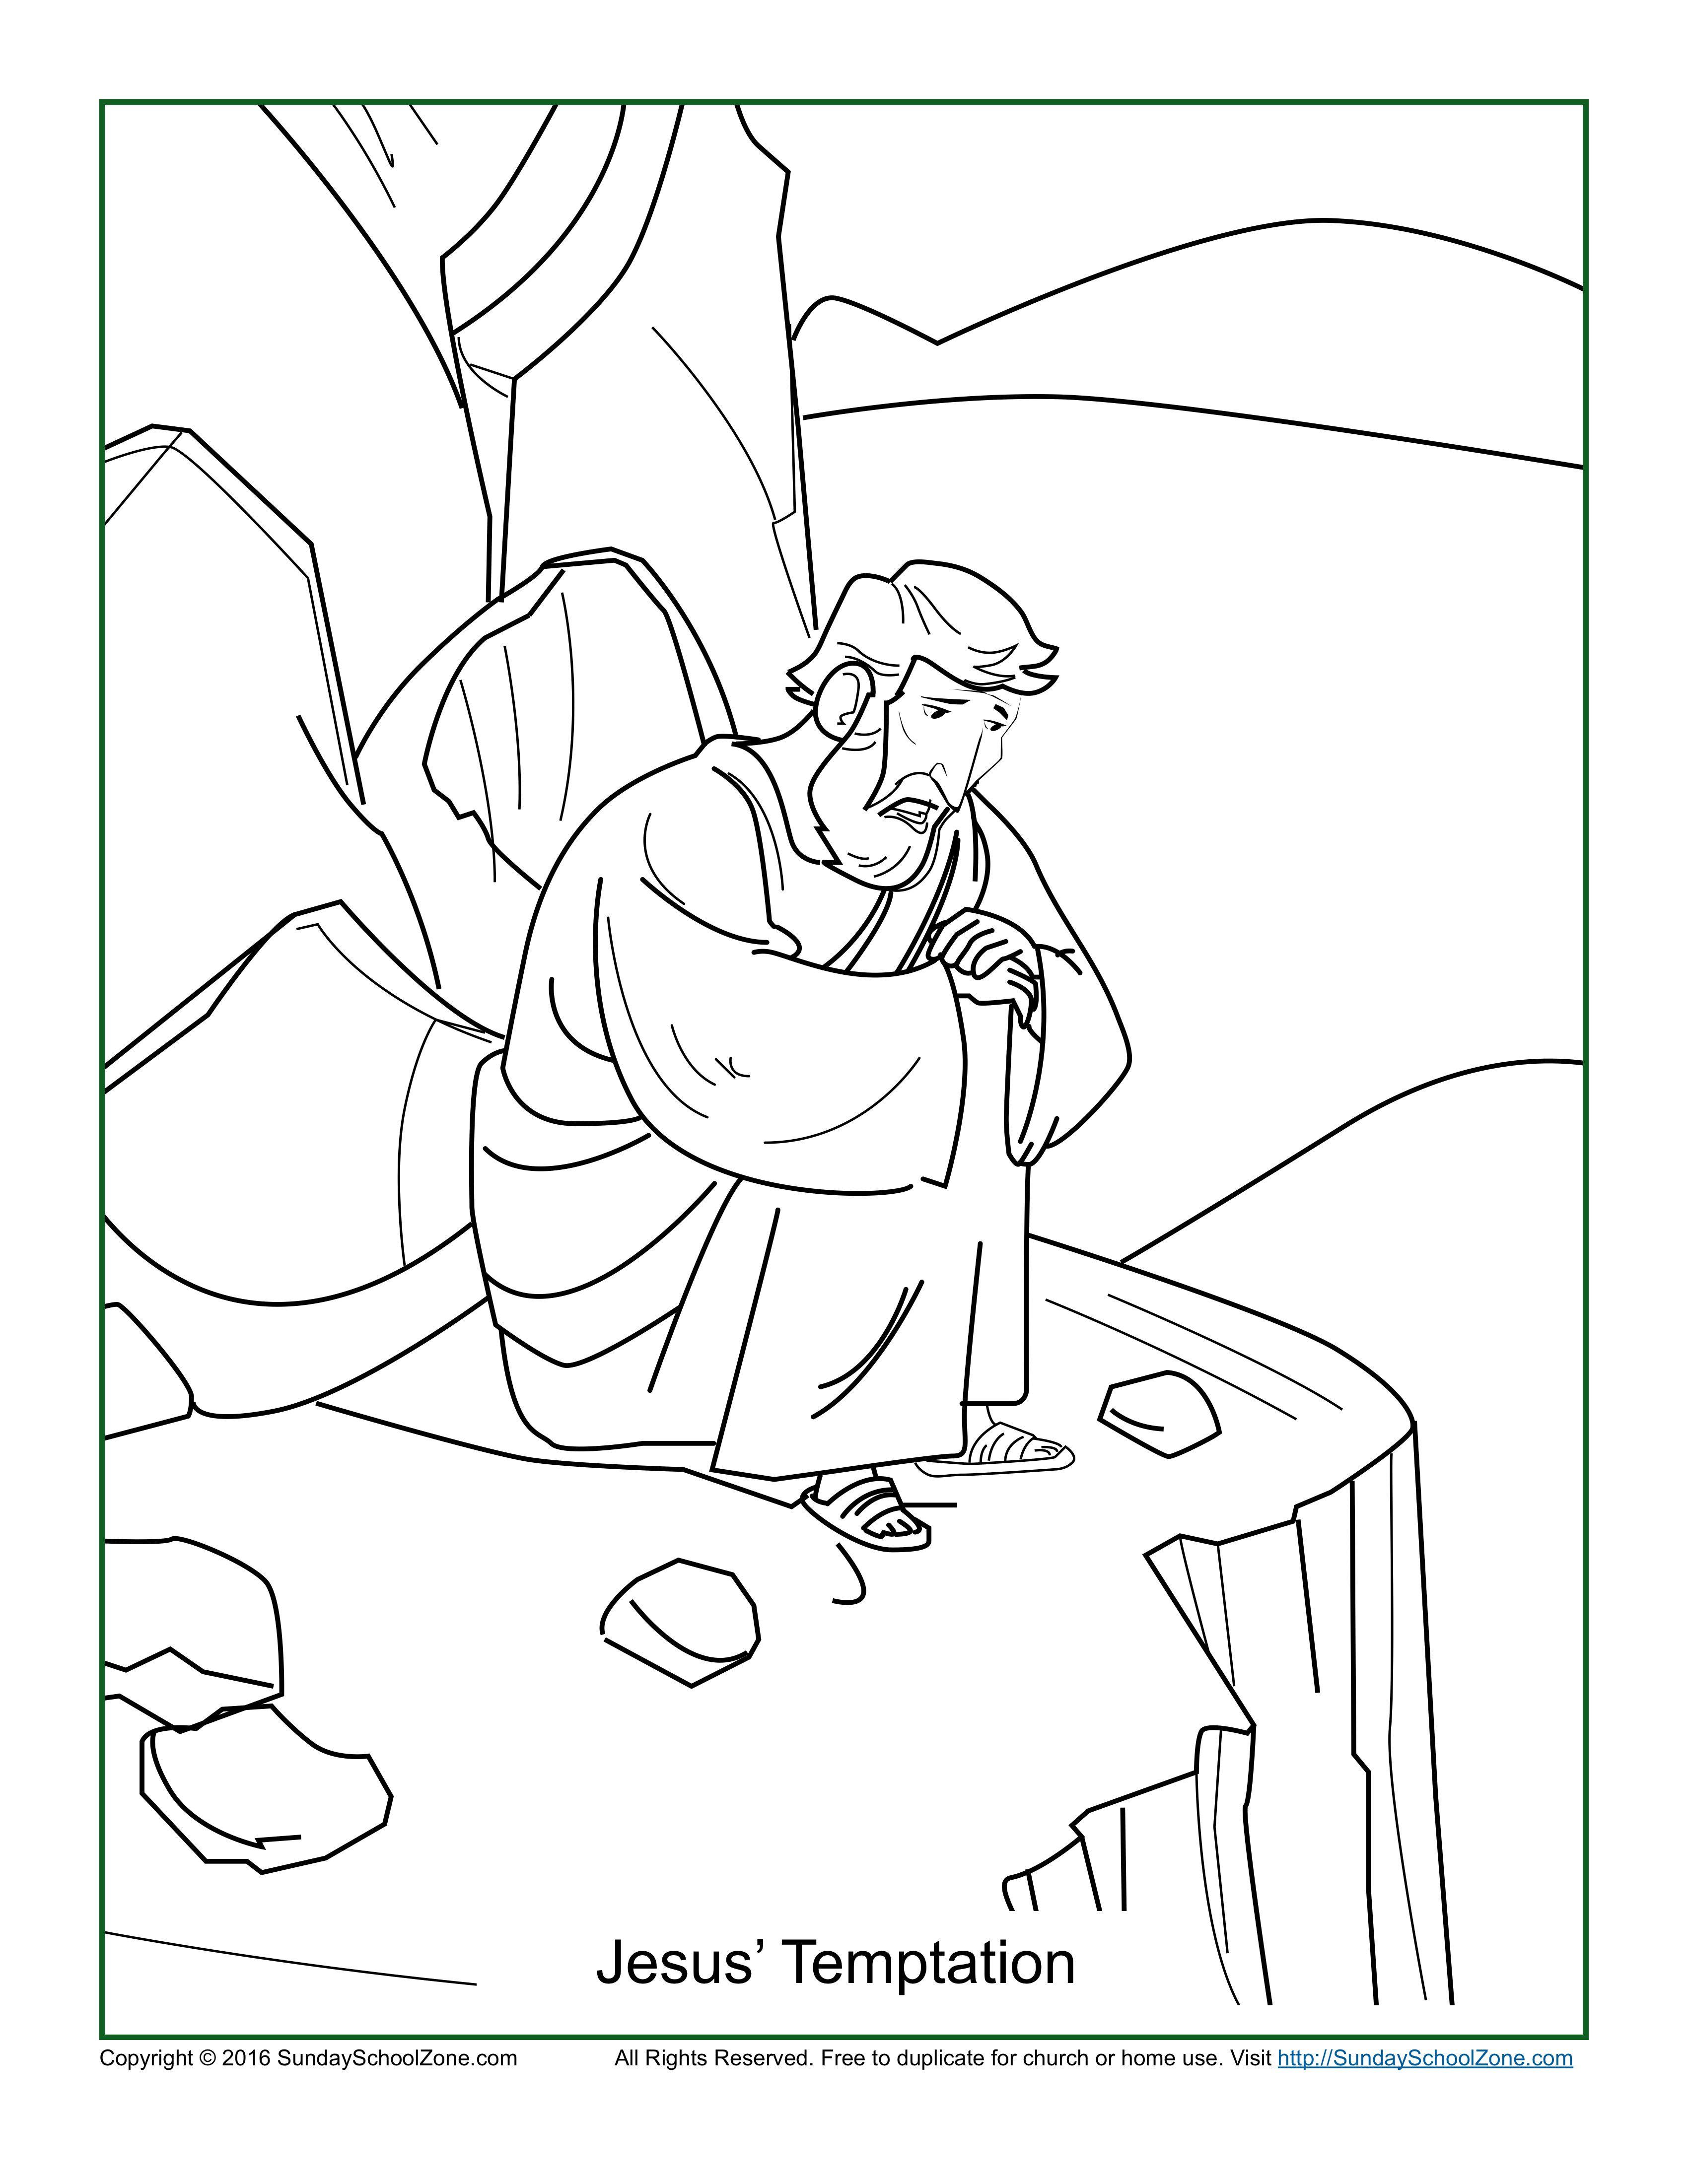 Jesus Temptation Coloring Page Pages Jesus Coloring Pages Childrens Bible Activities Bible Coloring Pages